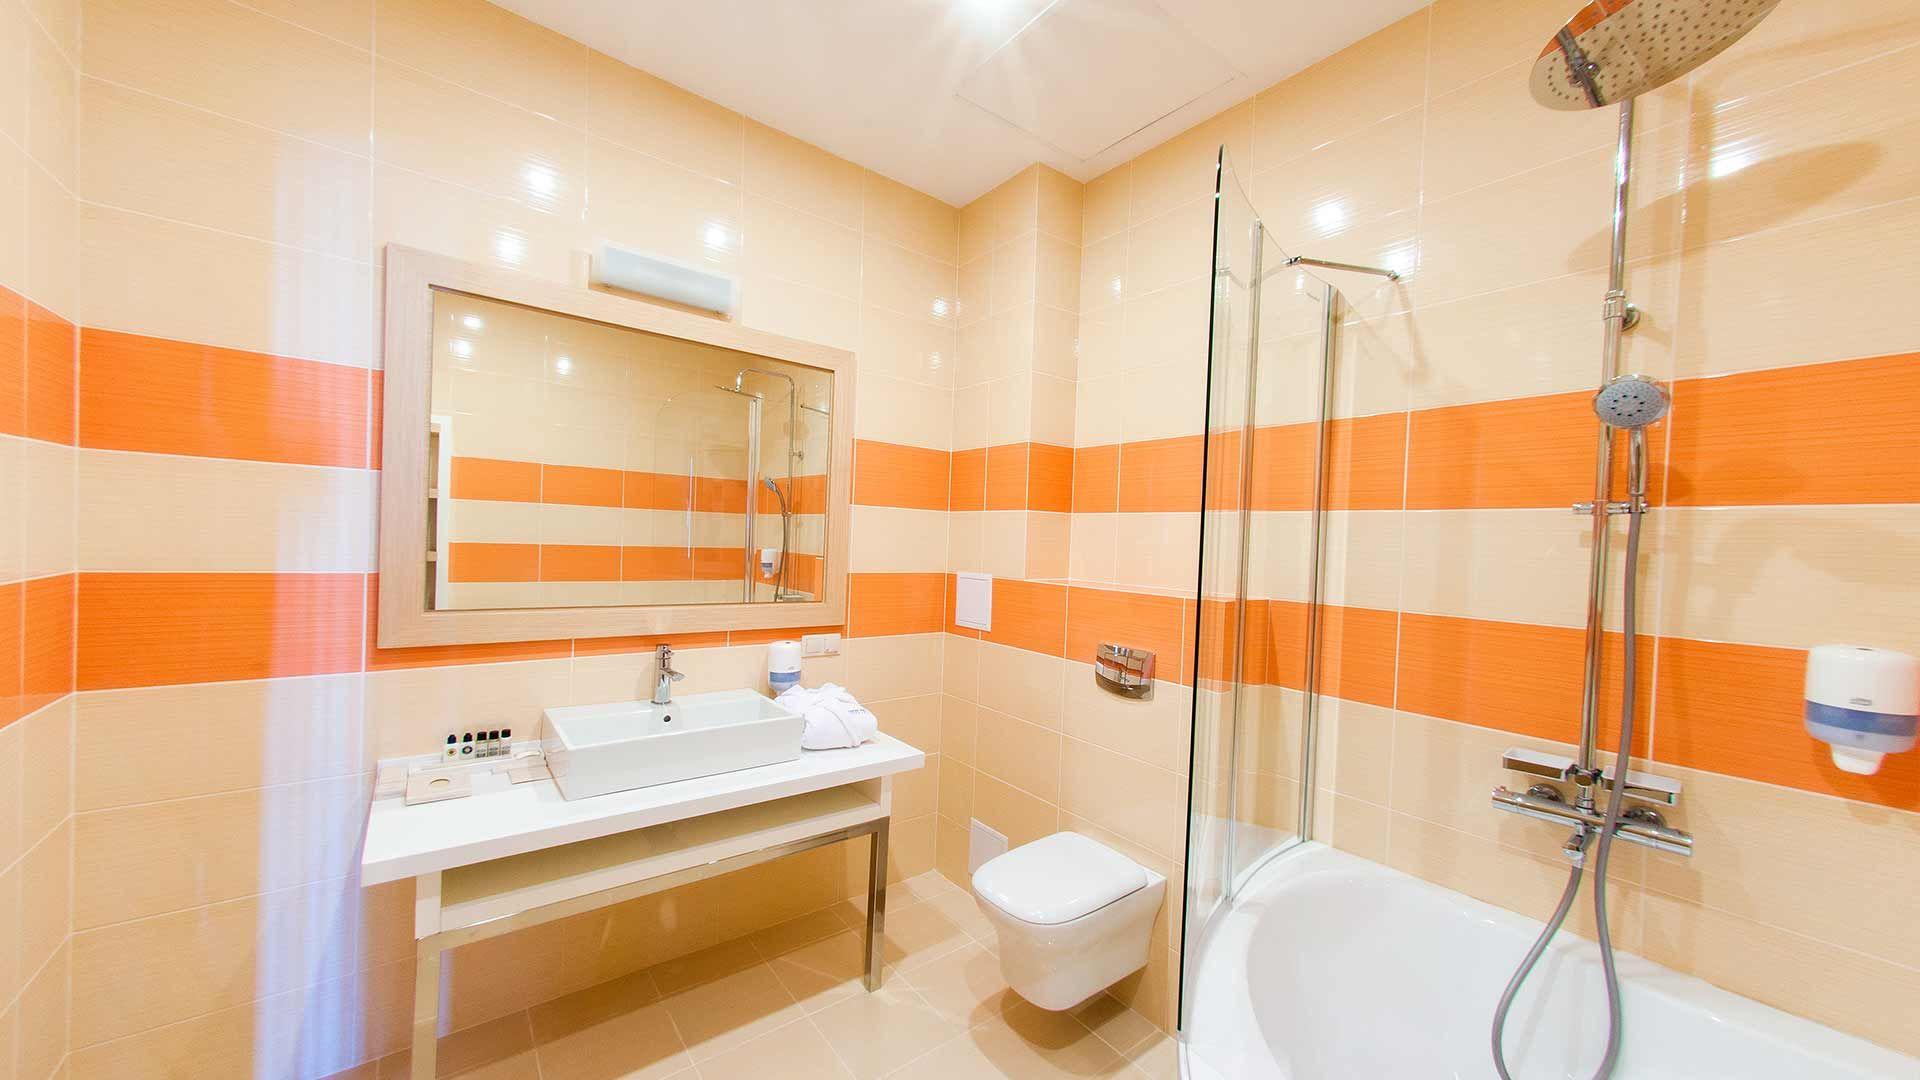 show me bathroom designs. Show Me Pictures Of Bathrooms In Orange Colour  Bathroom Design And